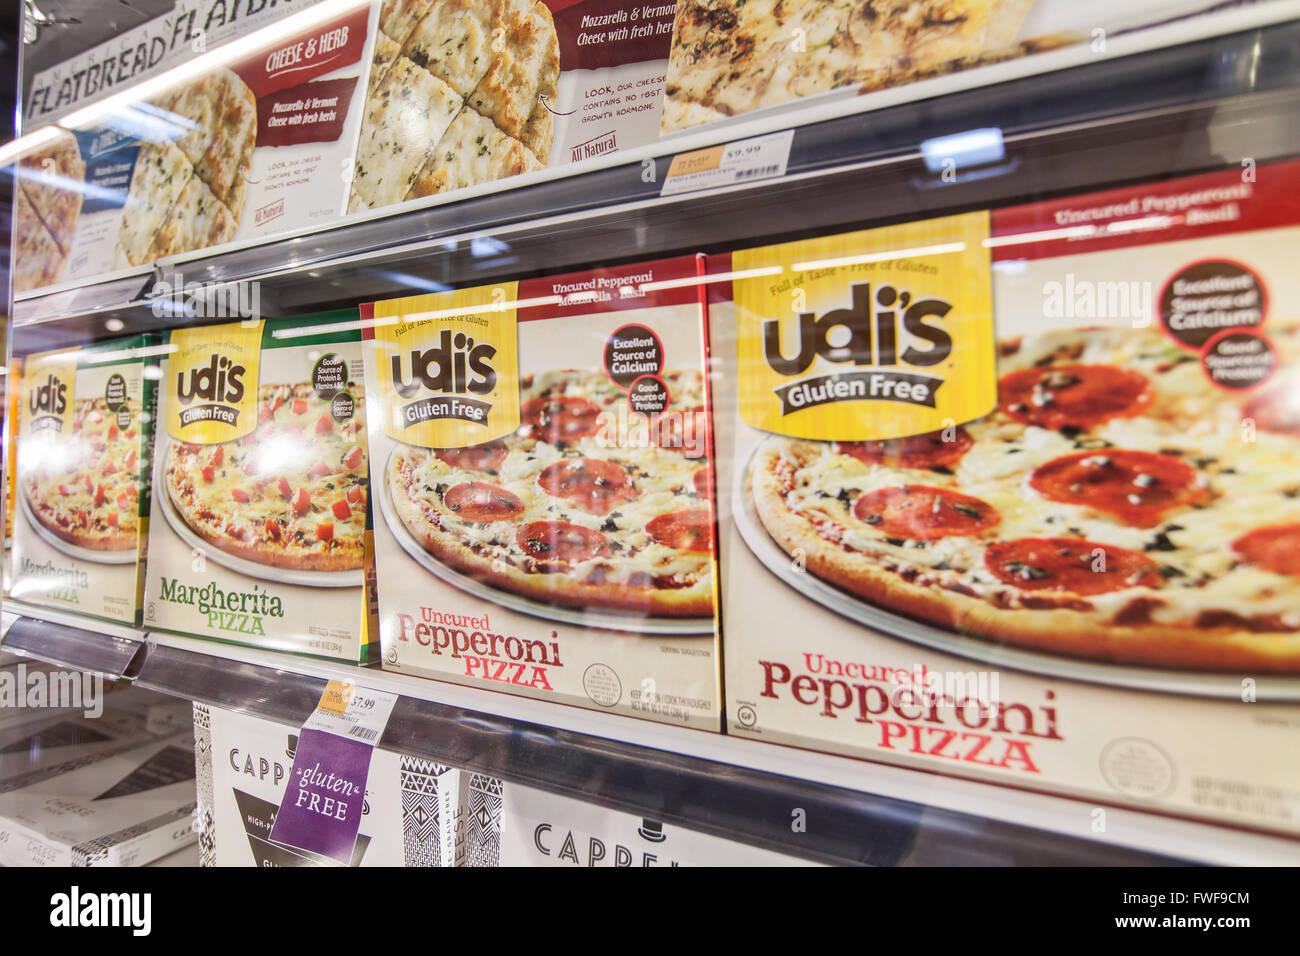 California Pizza Kitchen Gluten Free Frozen Pizza Review